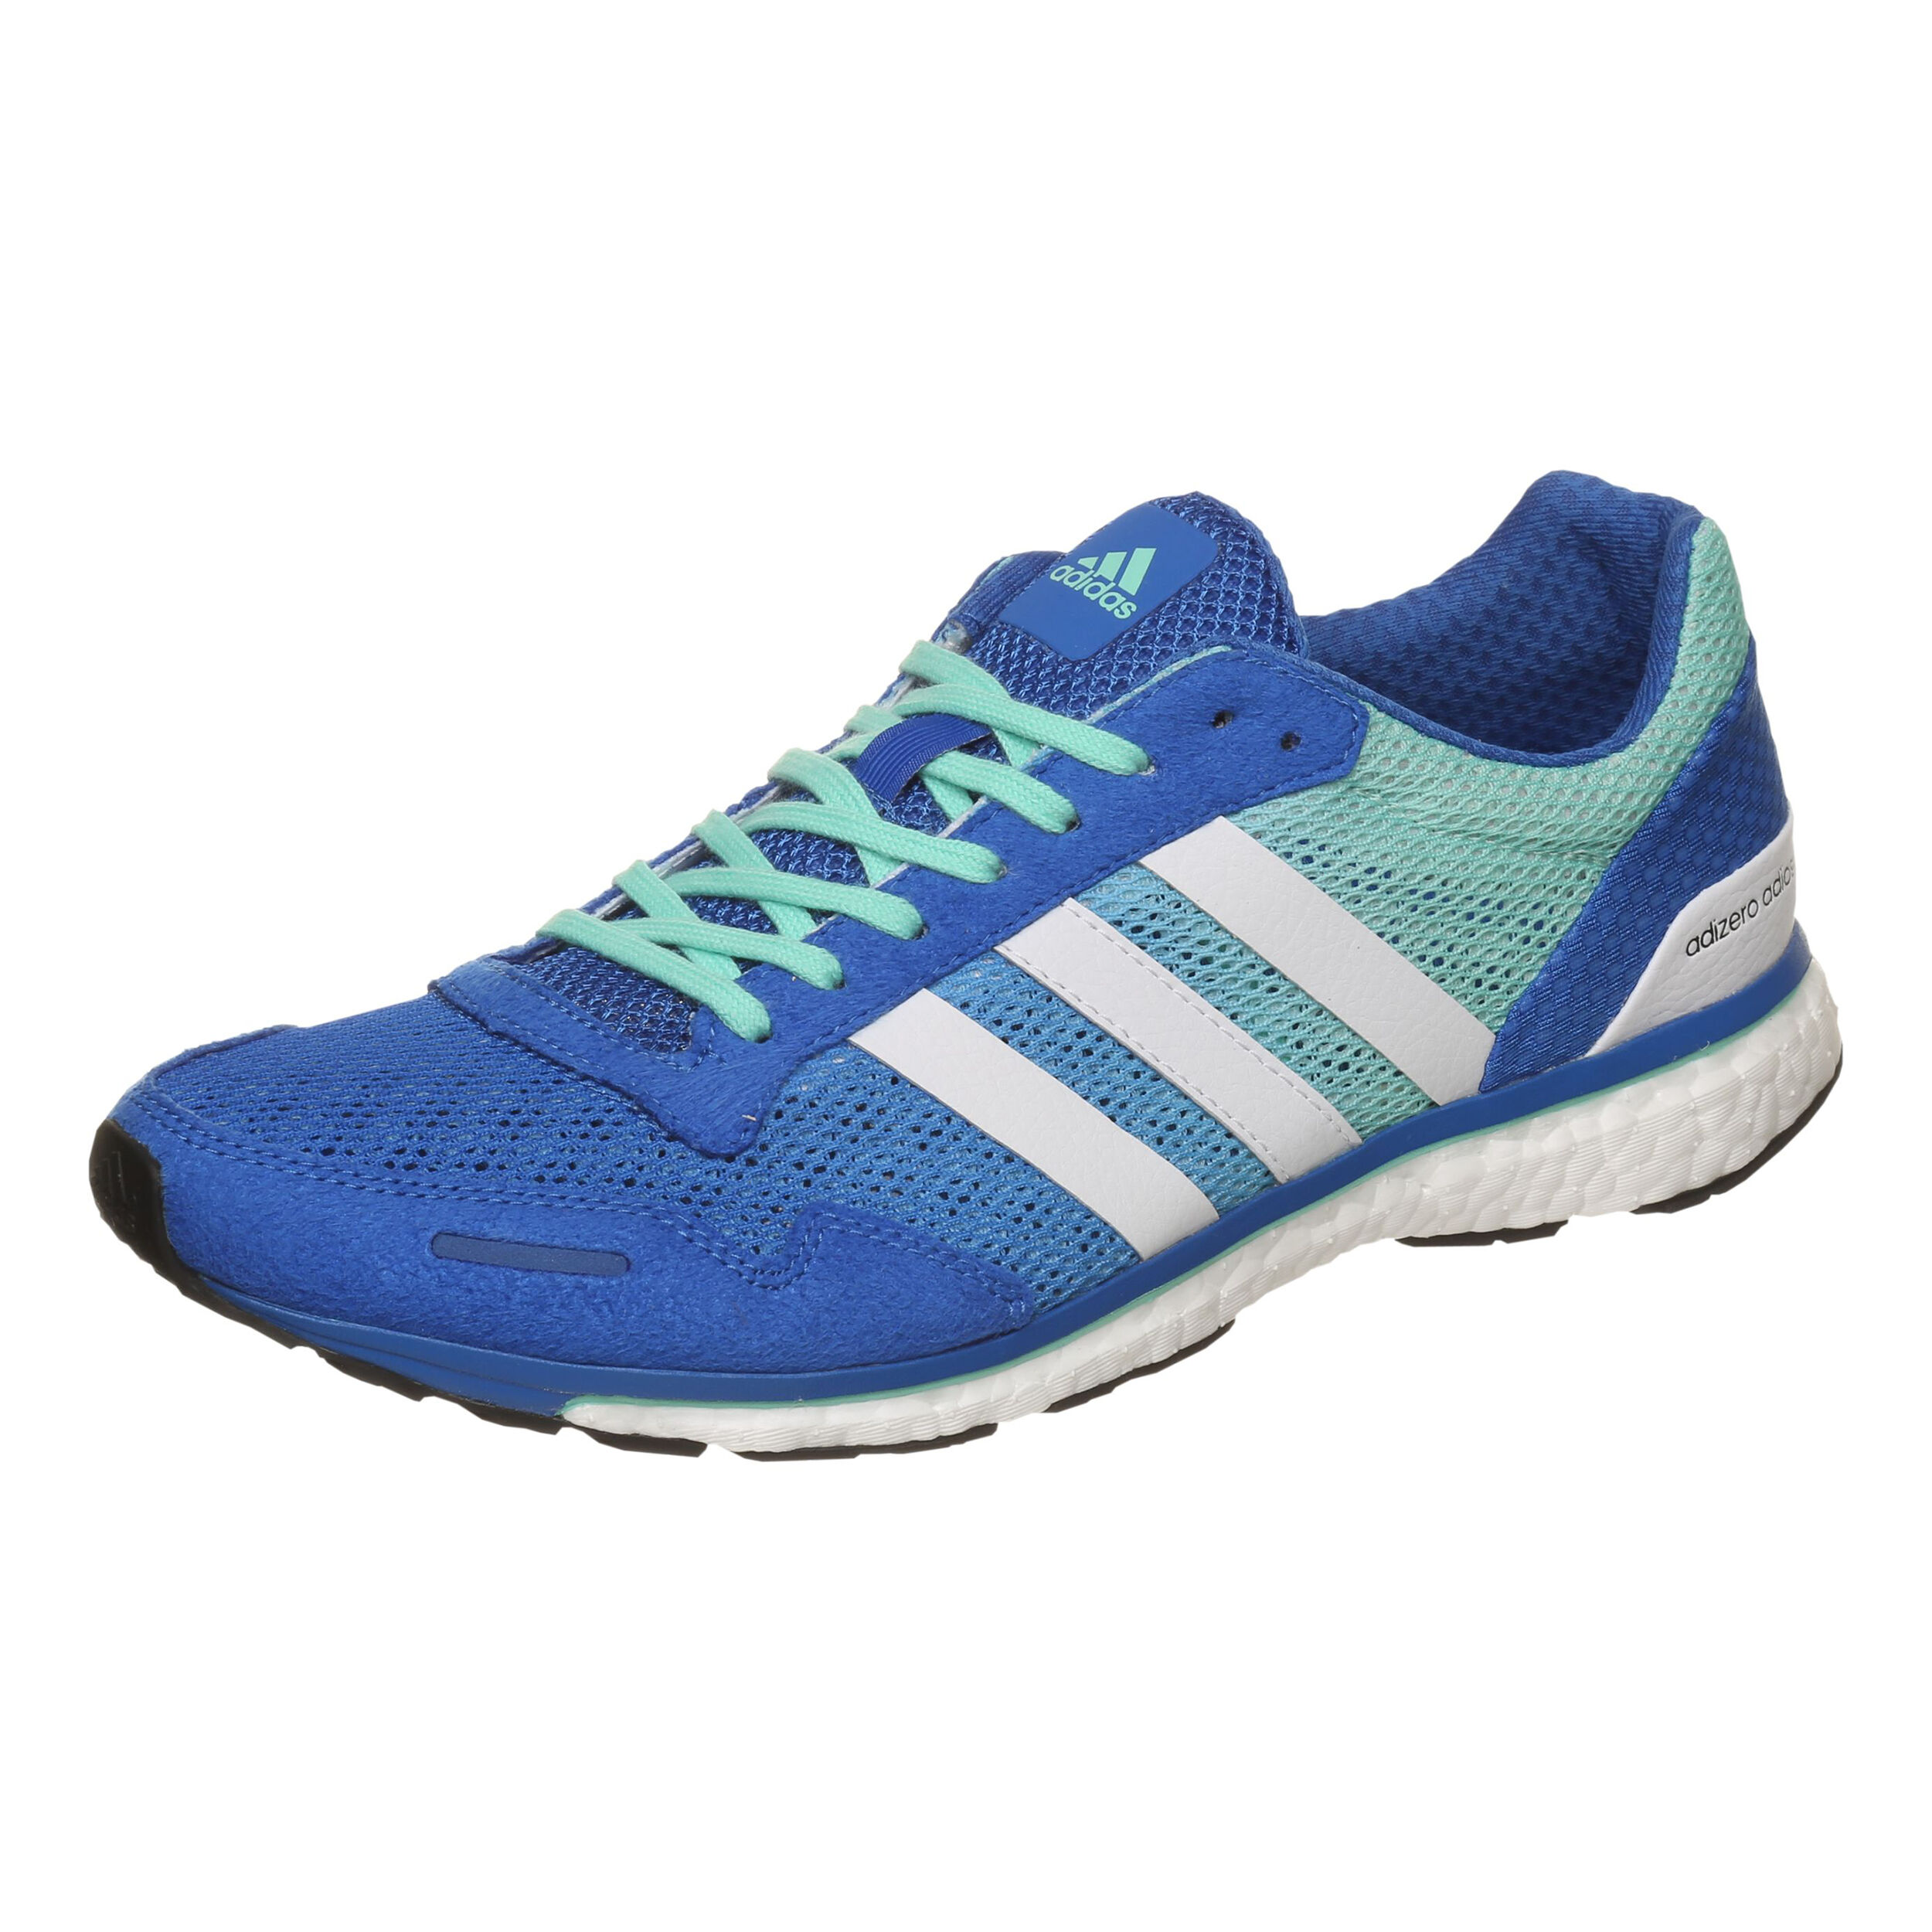 adidas Adizero Adios 3 Wettkampfschuh Herren Blau, Weiß